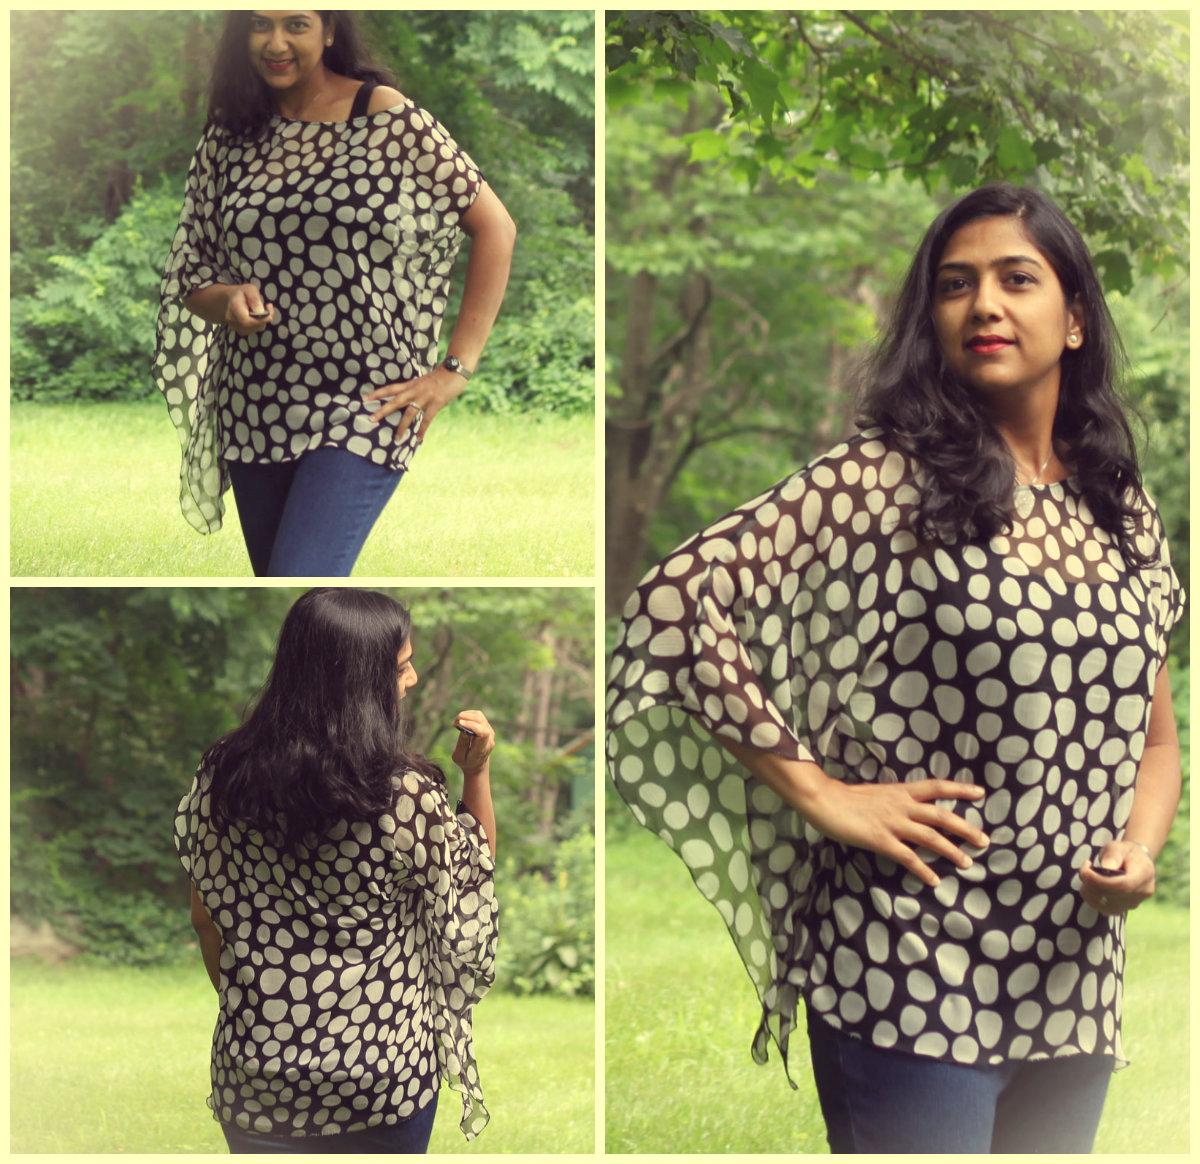 87529de8147 McCall's Misses'/Women's Tunics 6204 pattern review by Deepika